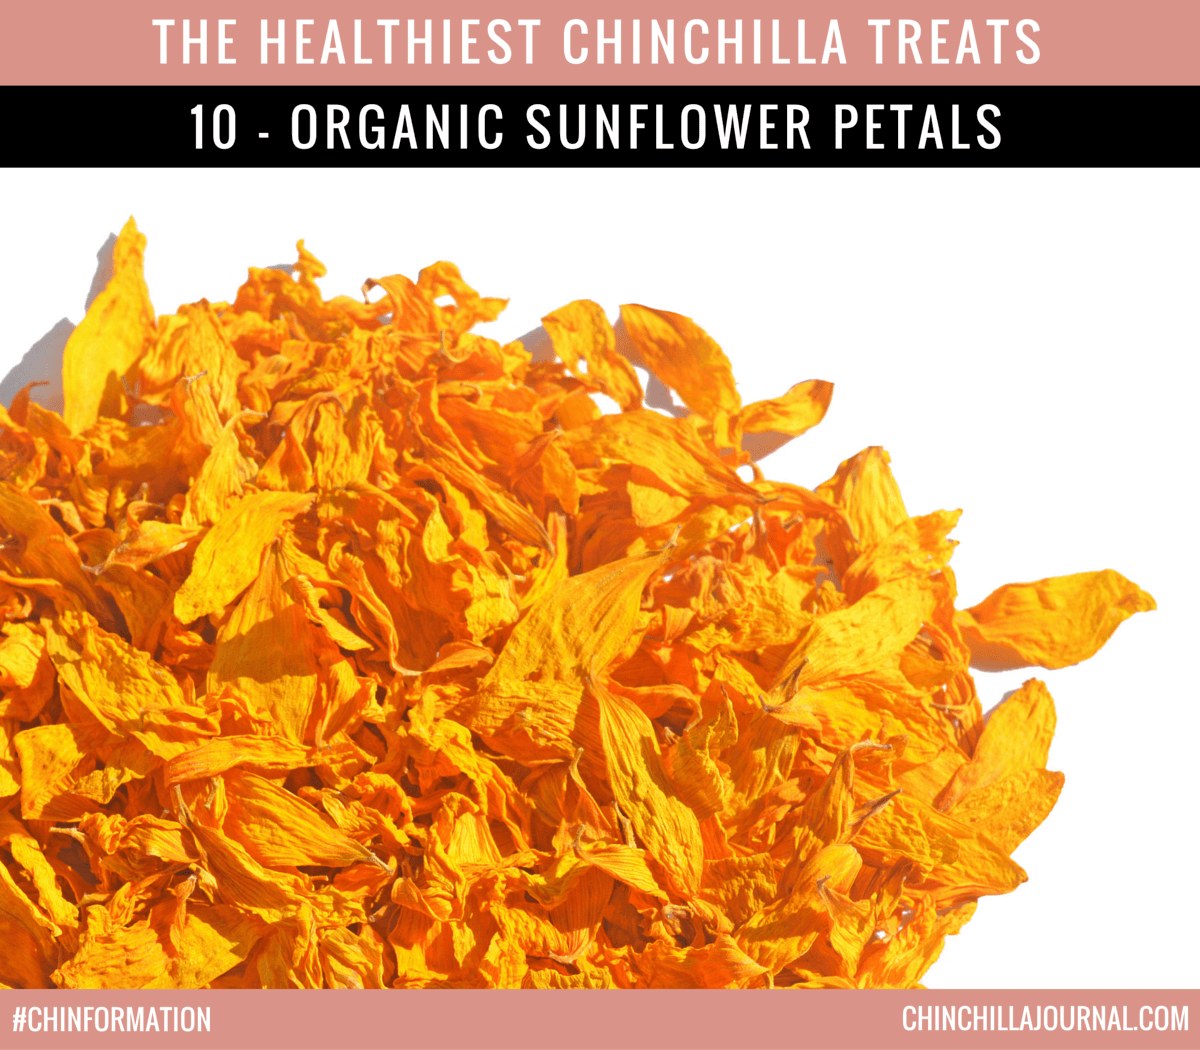 The Healthiest Chinchilla Treats - 10 - Organic Sunflower Petals